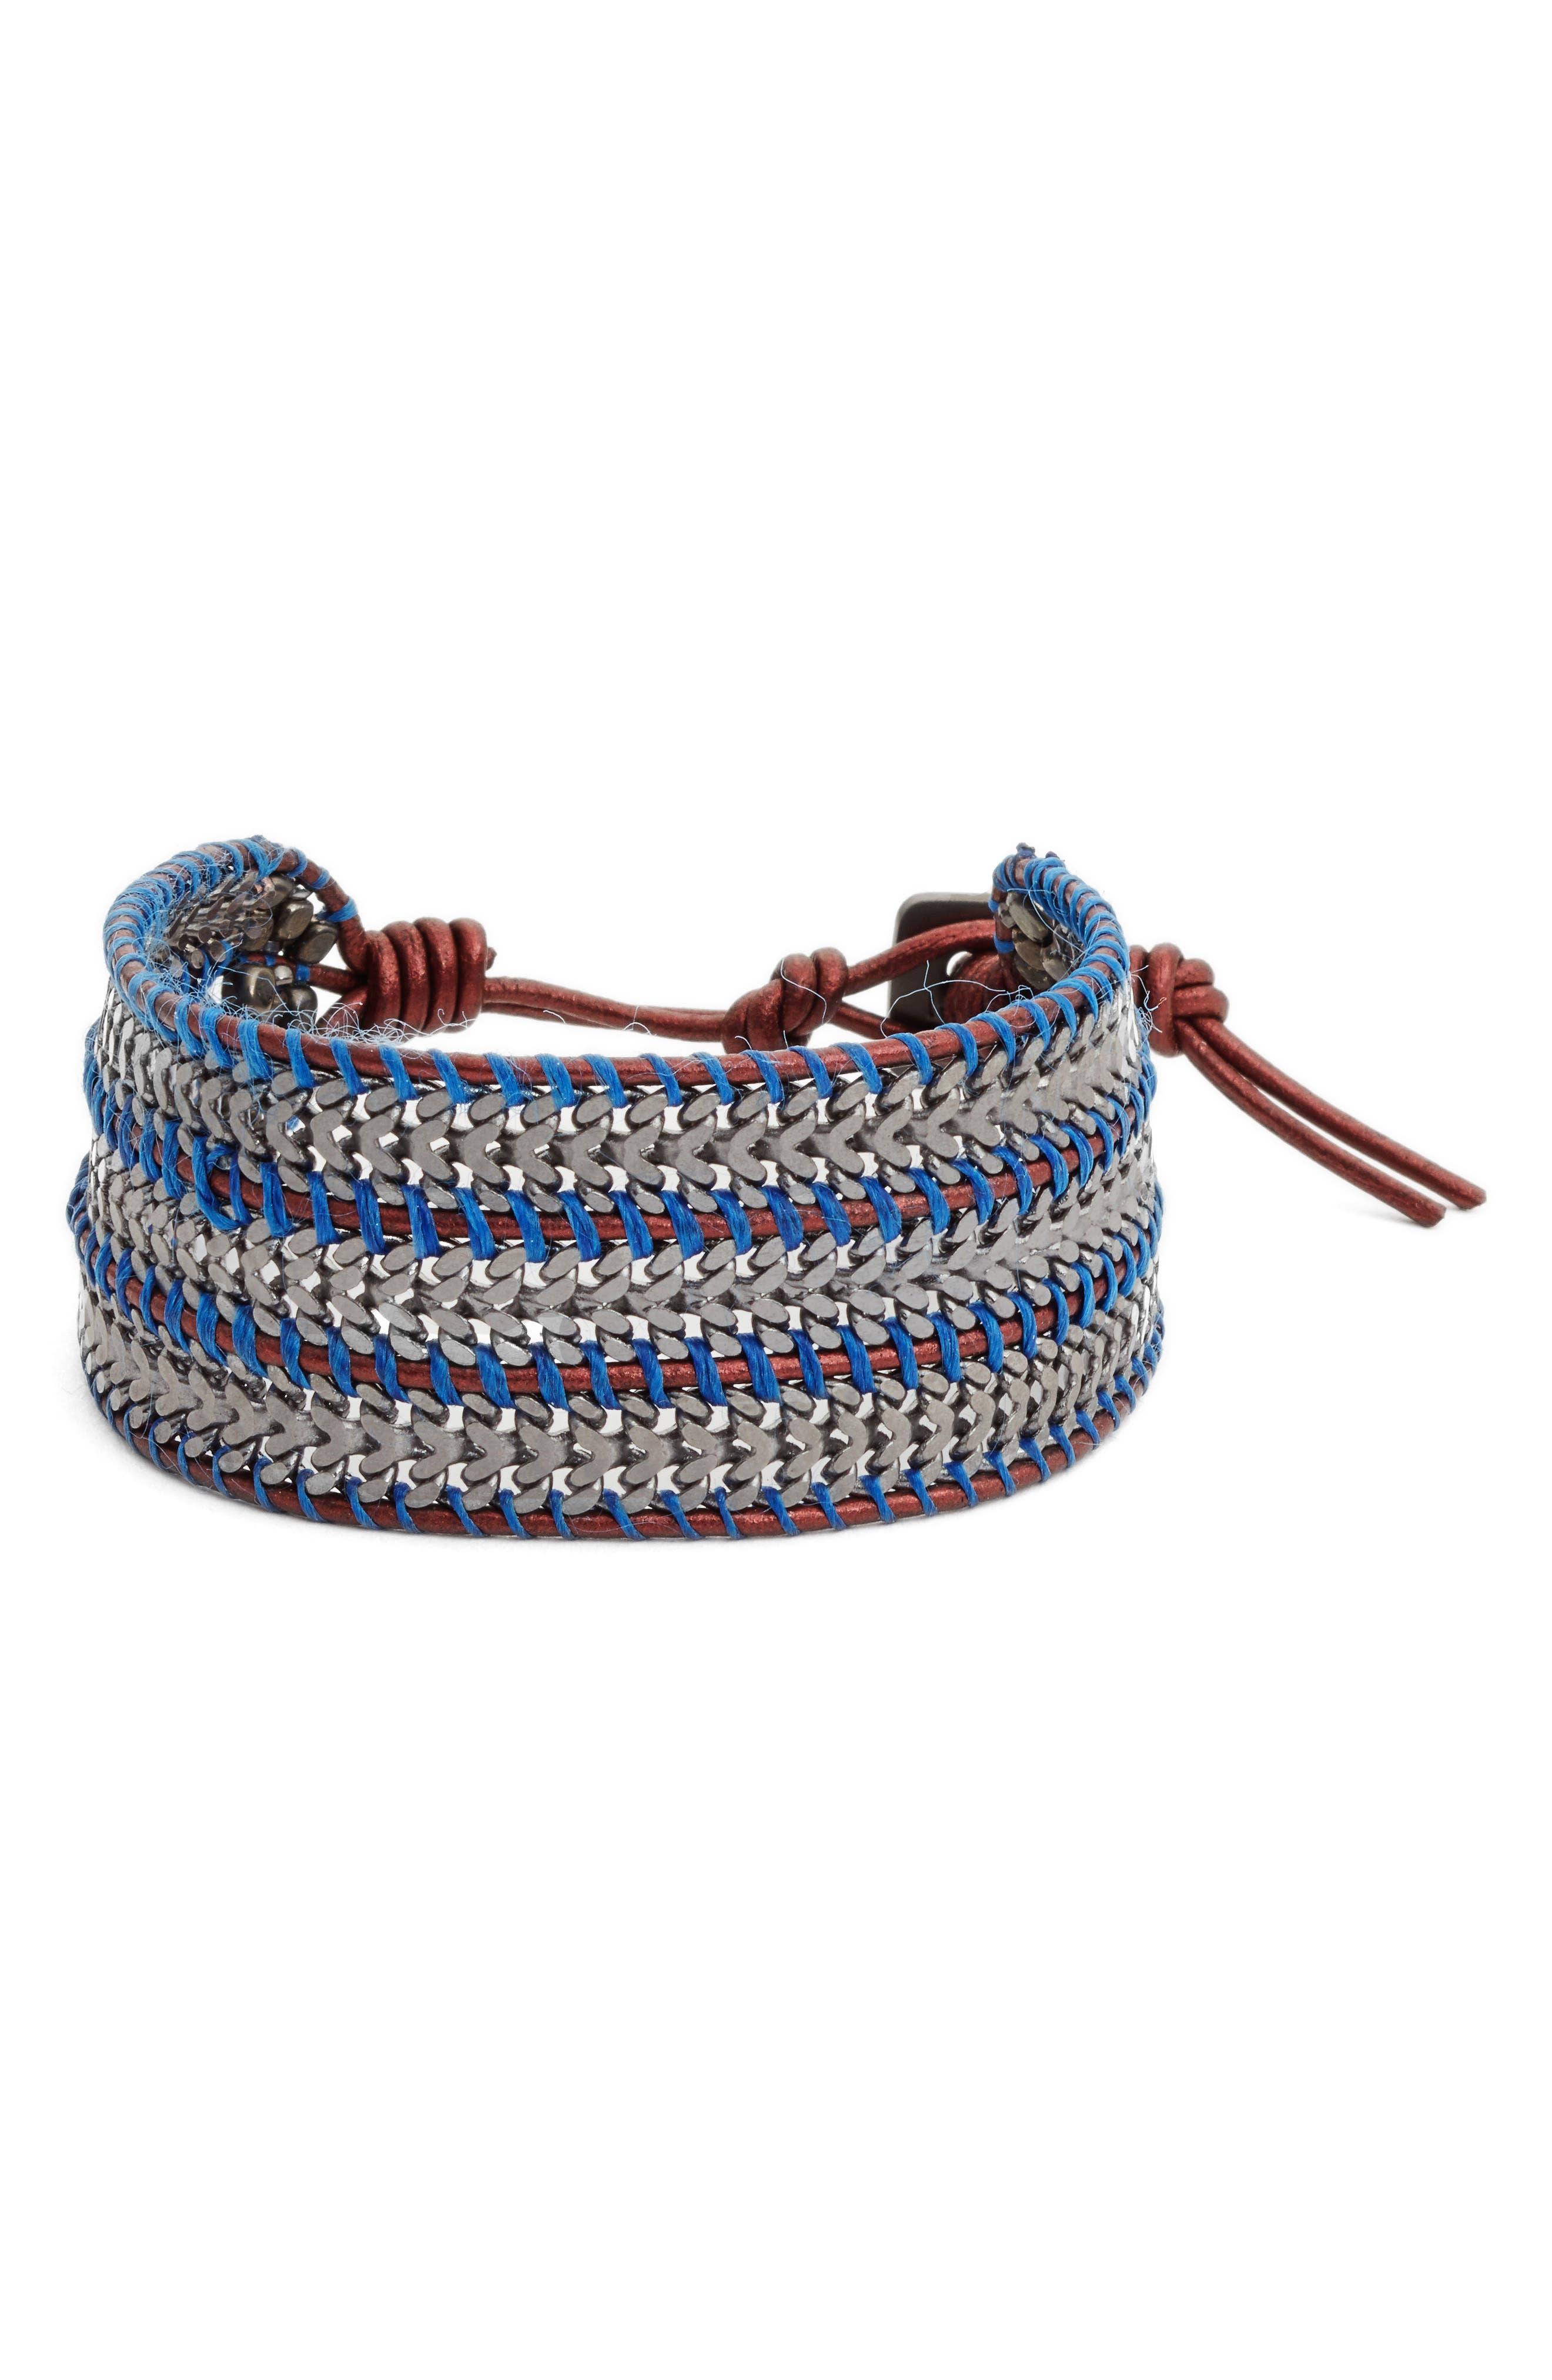 Trush Chain & Leather Bracelet,                             Main thumbnail 1, color,                             Gunmetal